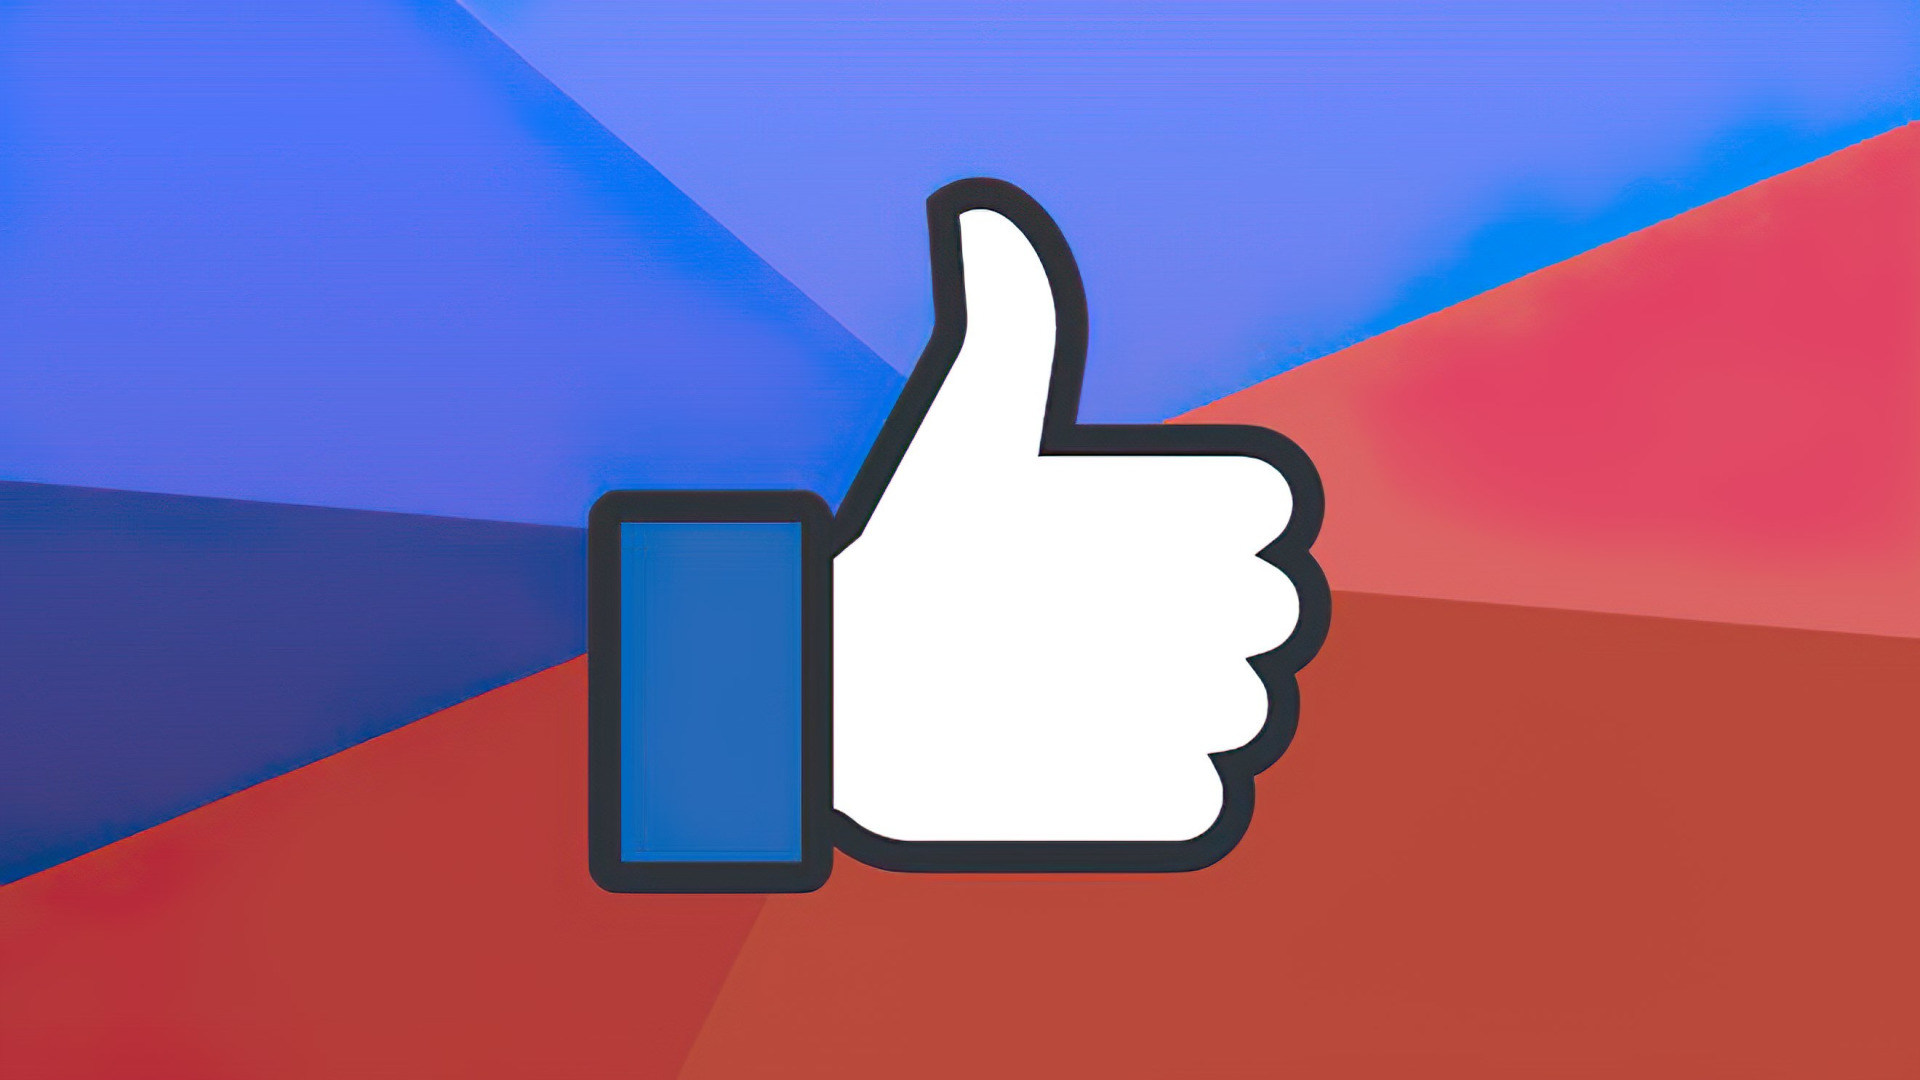 Facebook, Logo, Social Network, soziales Netzwerk, Social Media, Daumen, Thumb Up, Facebook Daumen, Thumb, Facebook Thumb Up